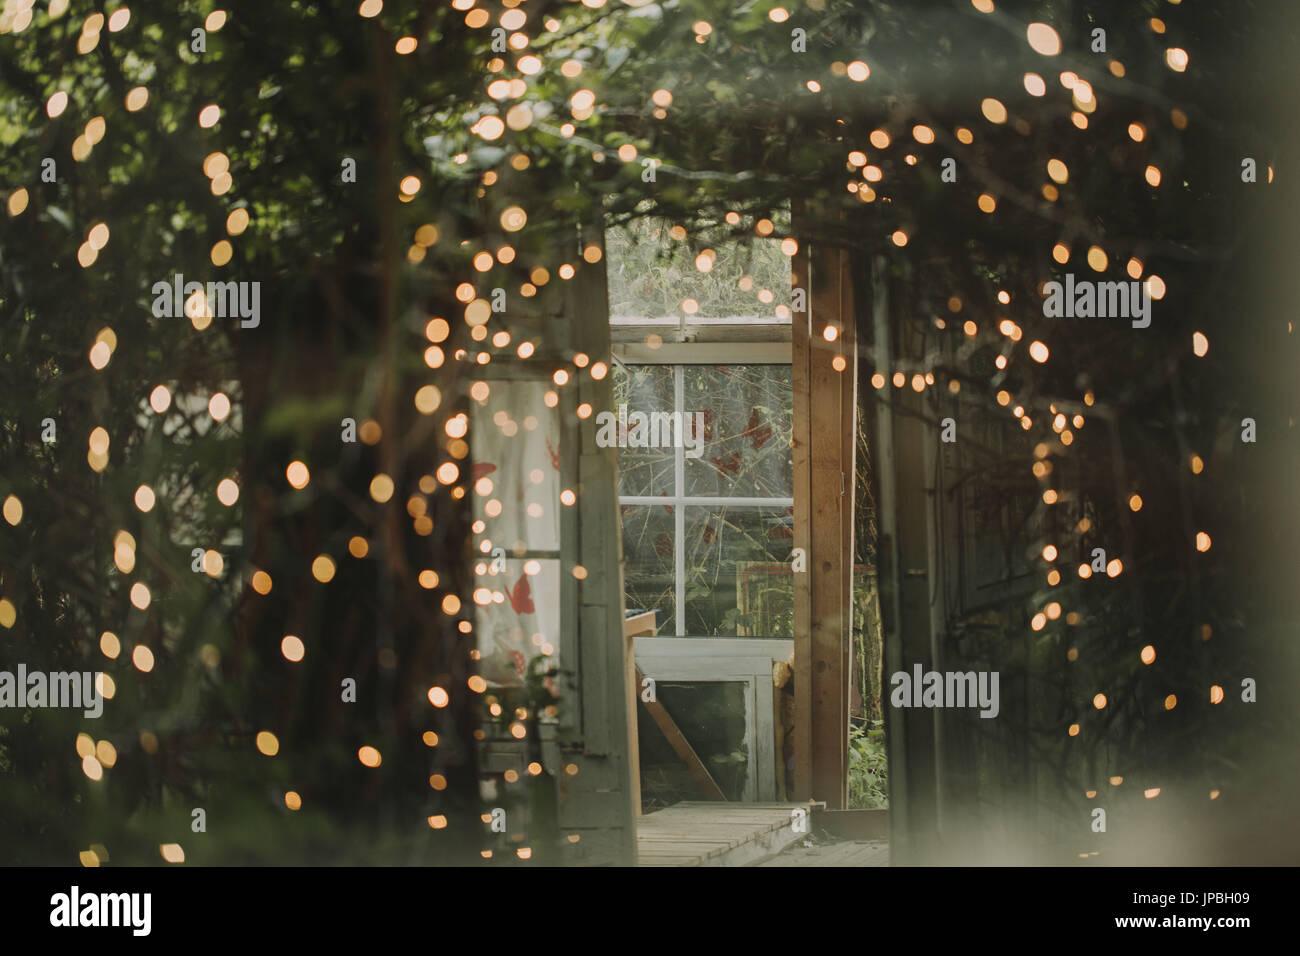 Alternative wedding, garden shed, strings of lights - Stock Image